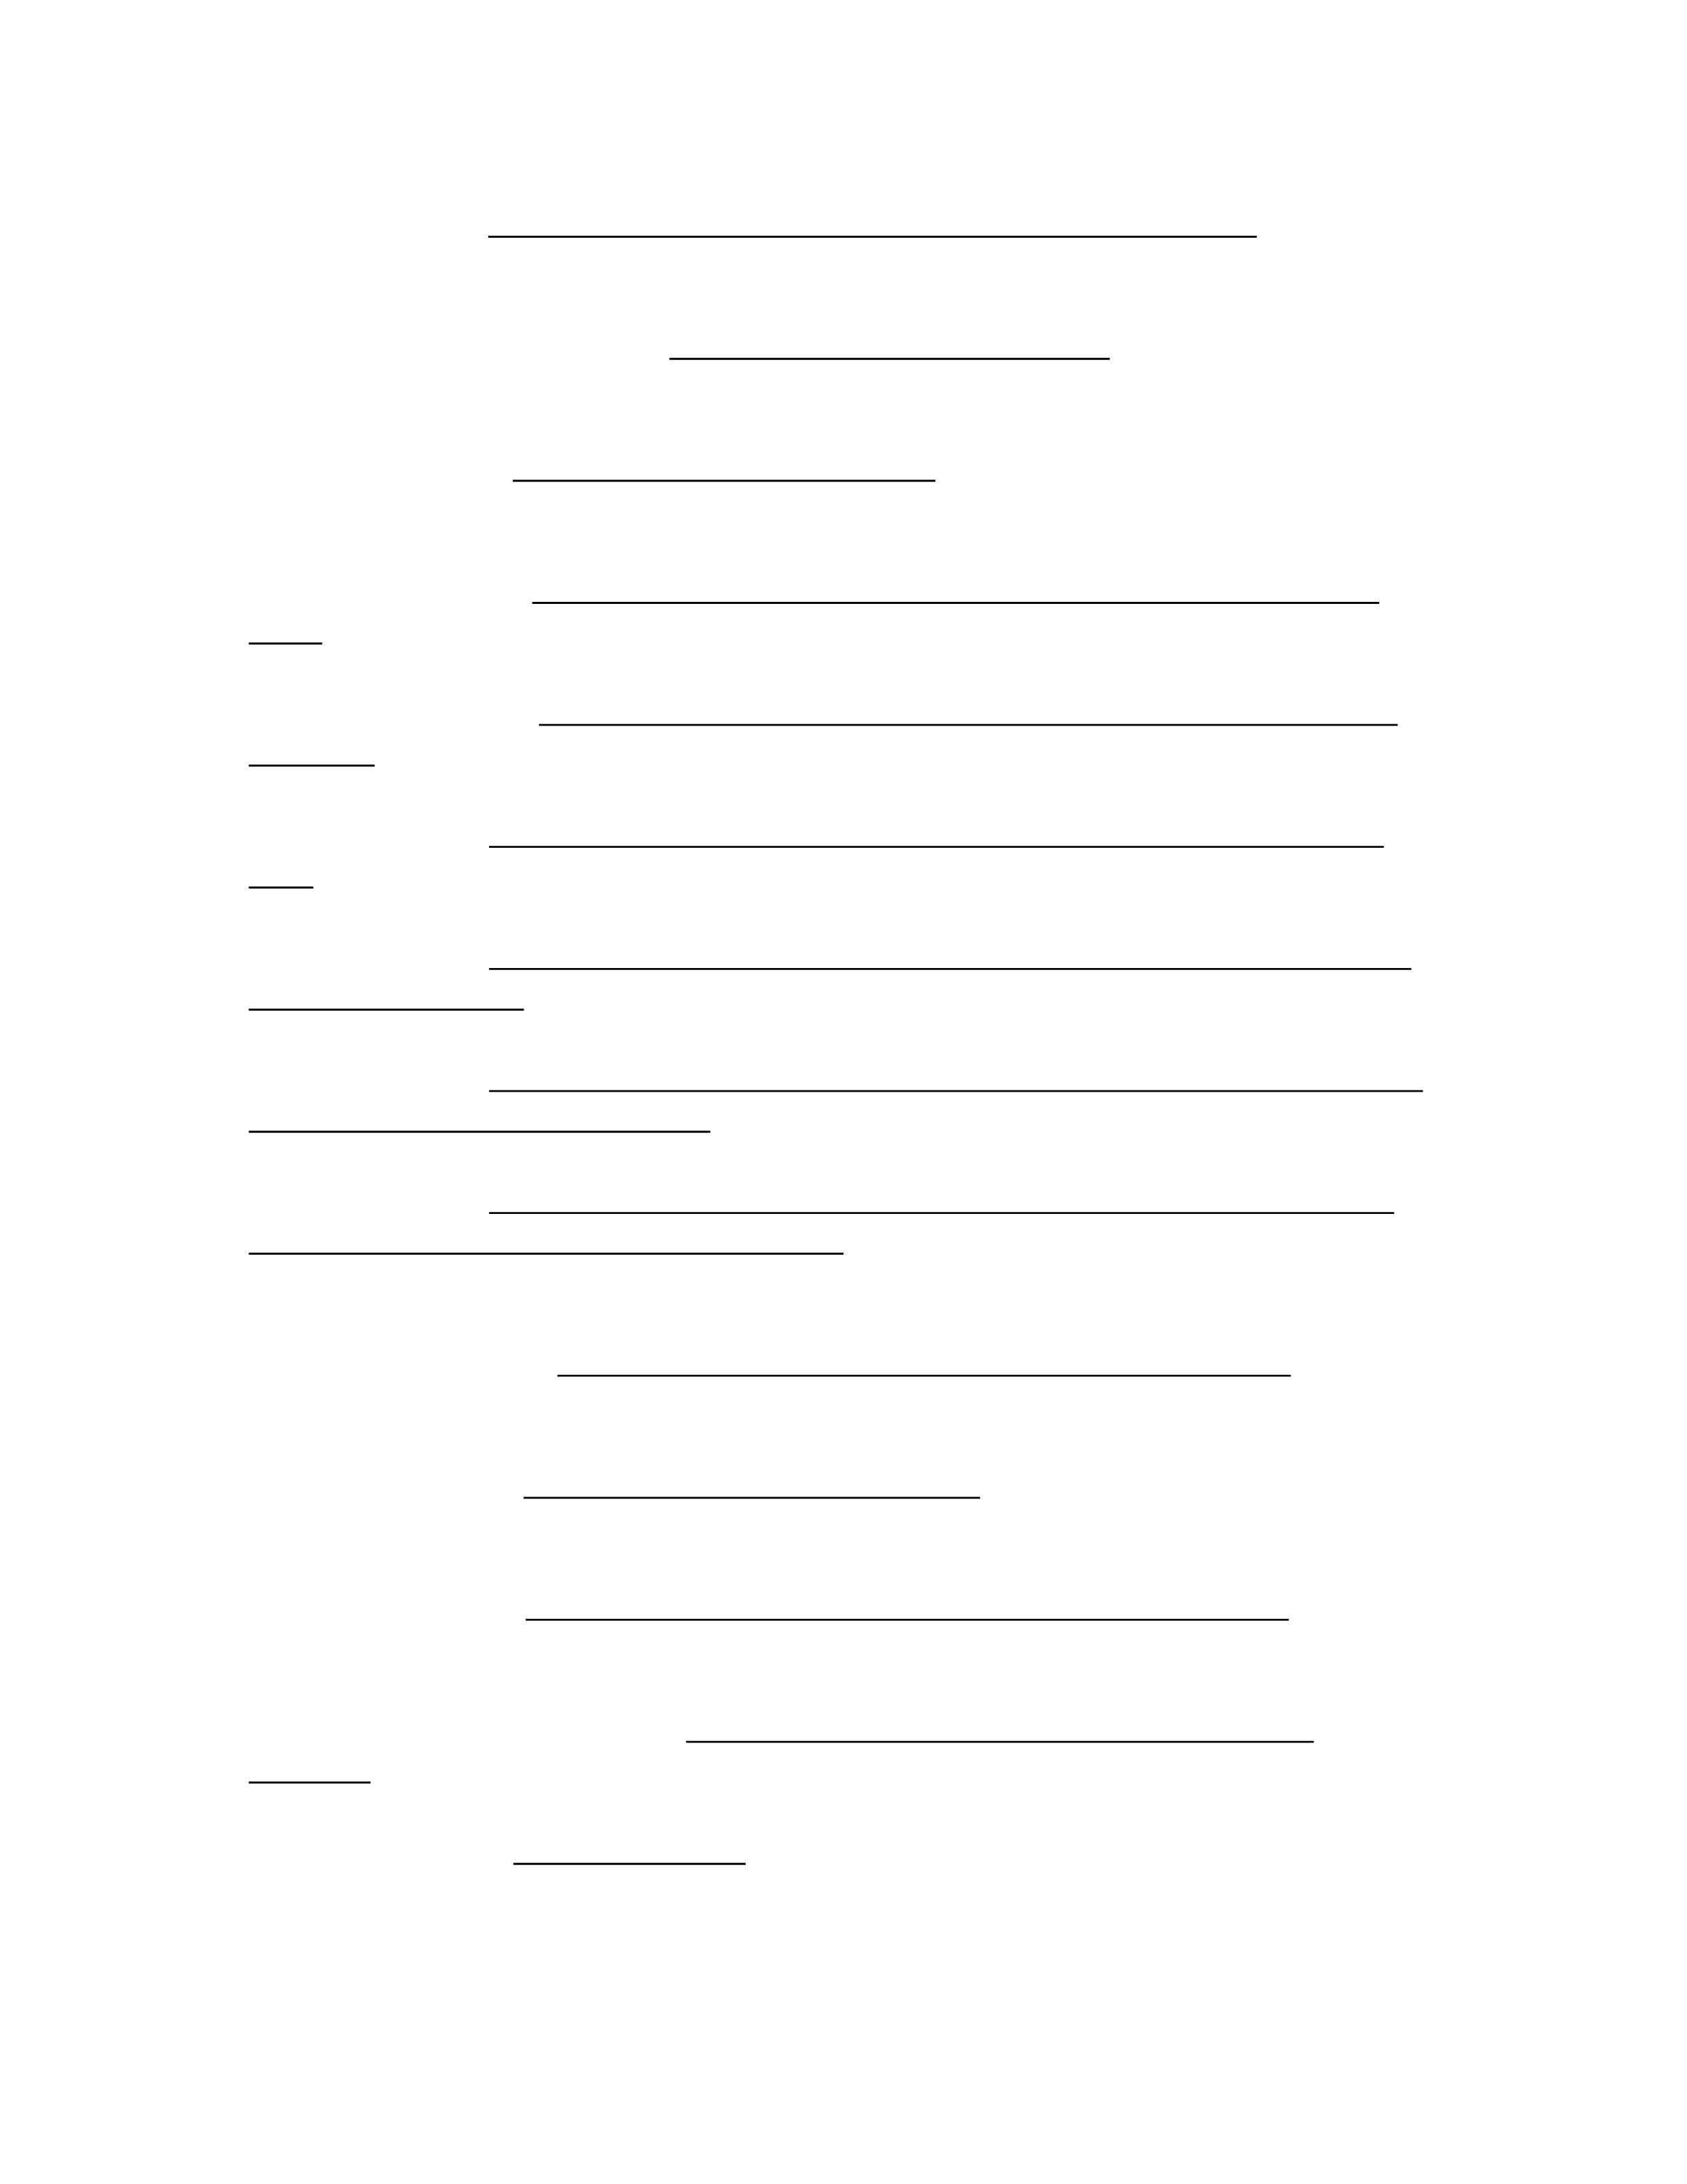 SSL_BTM_Exhibit_.pdf_37